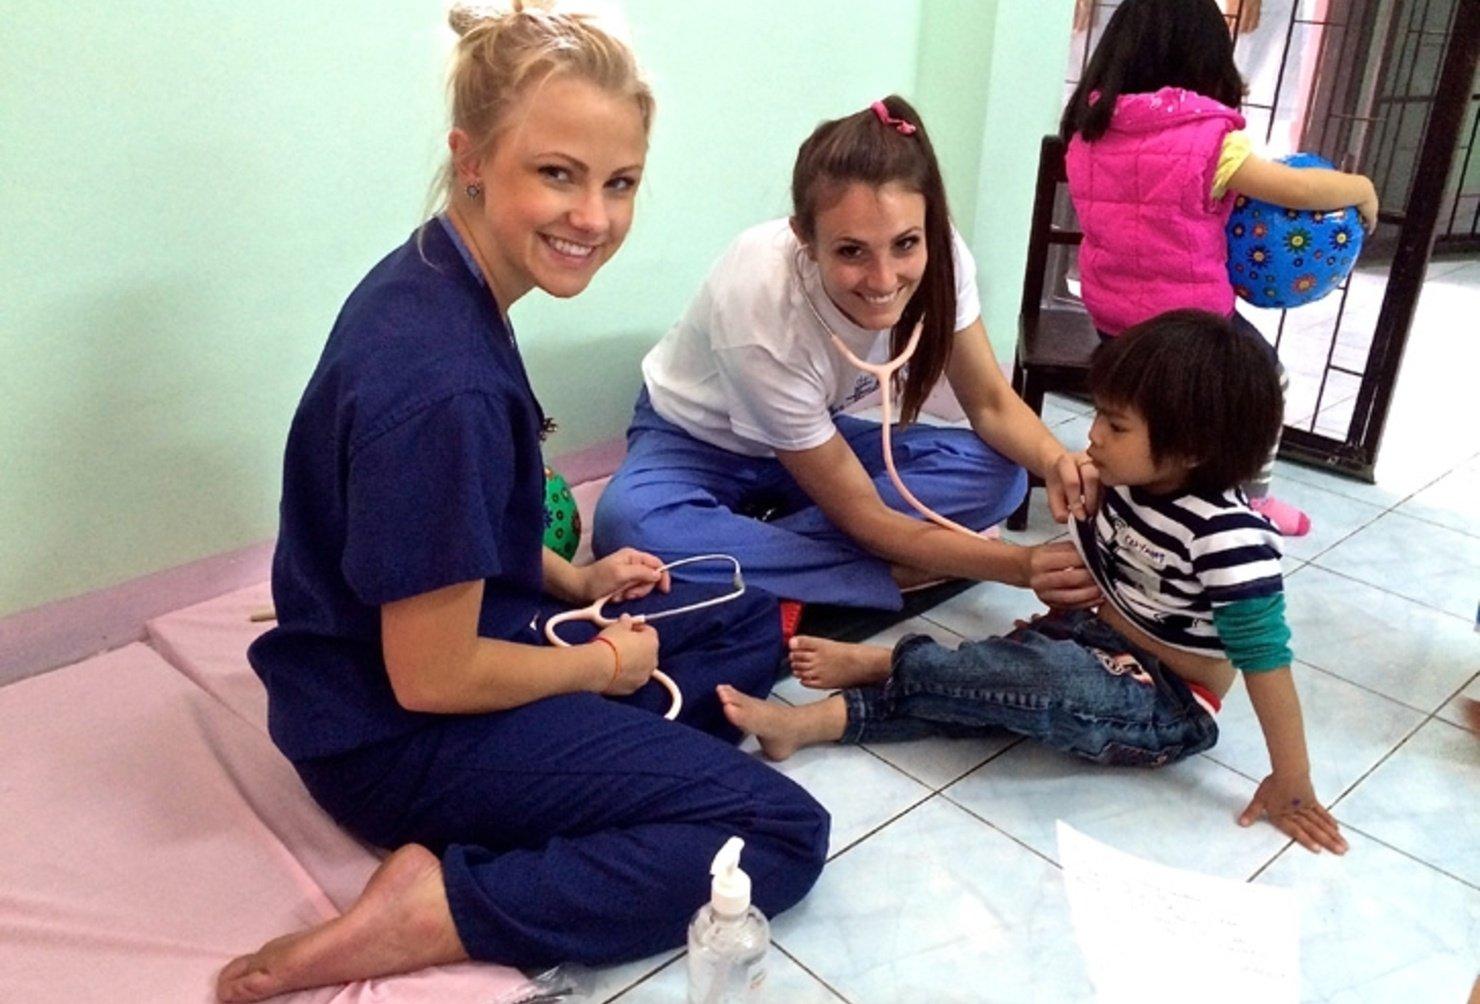 Thailand Medical Volunteers Real Gap Experience